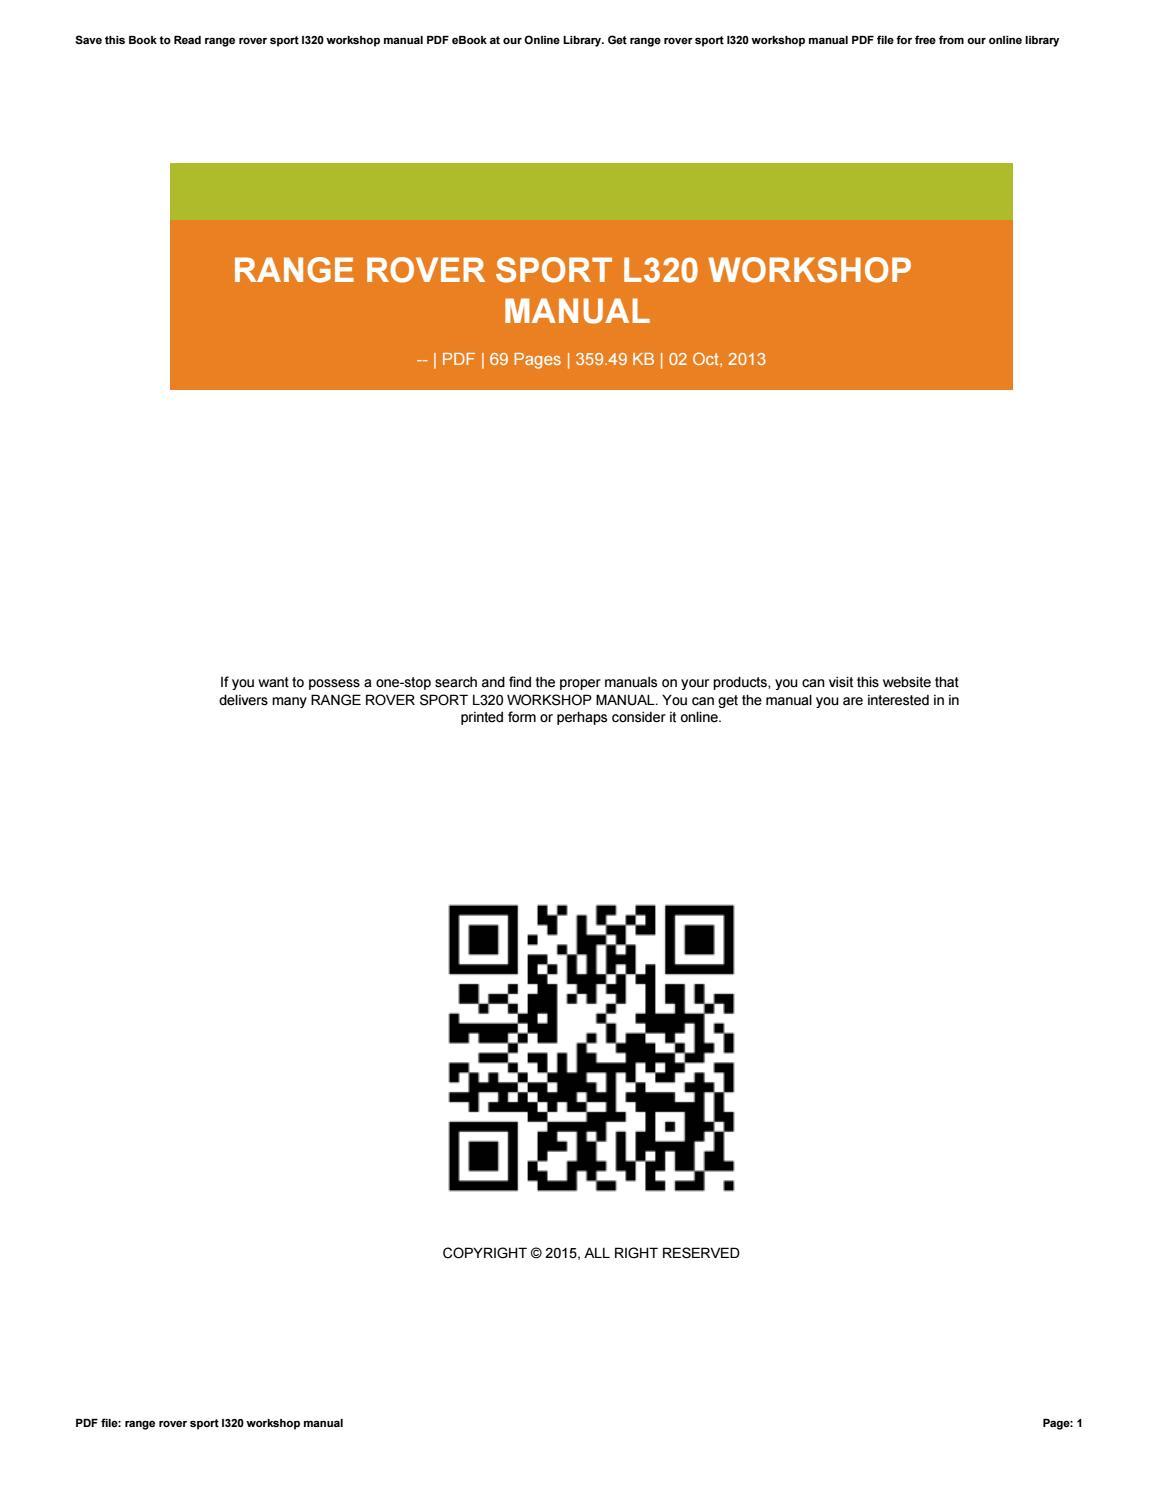 Range Rover Sport Workshop Manual   Wiring Library